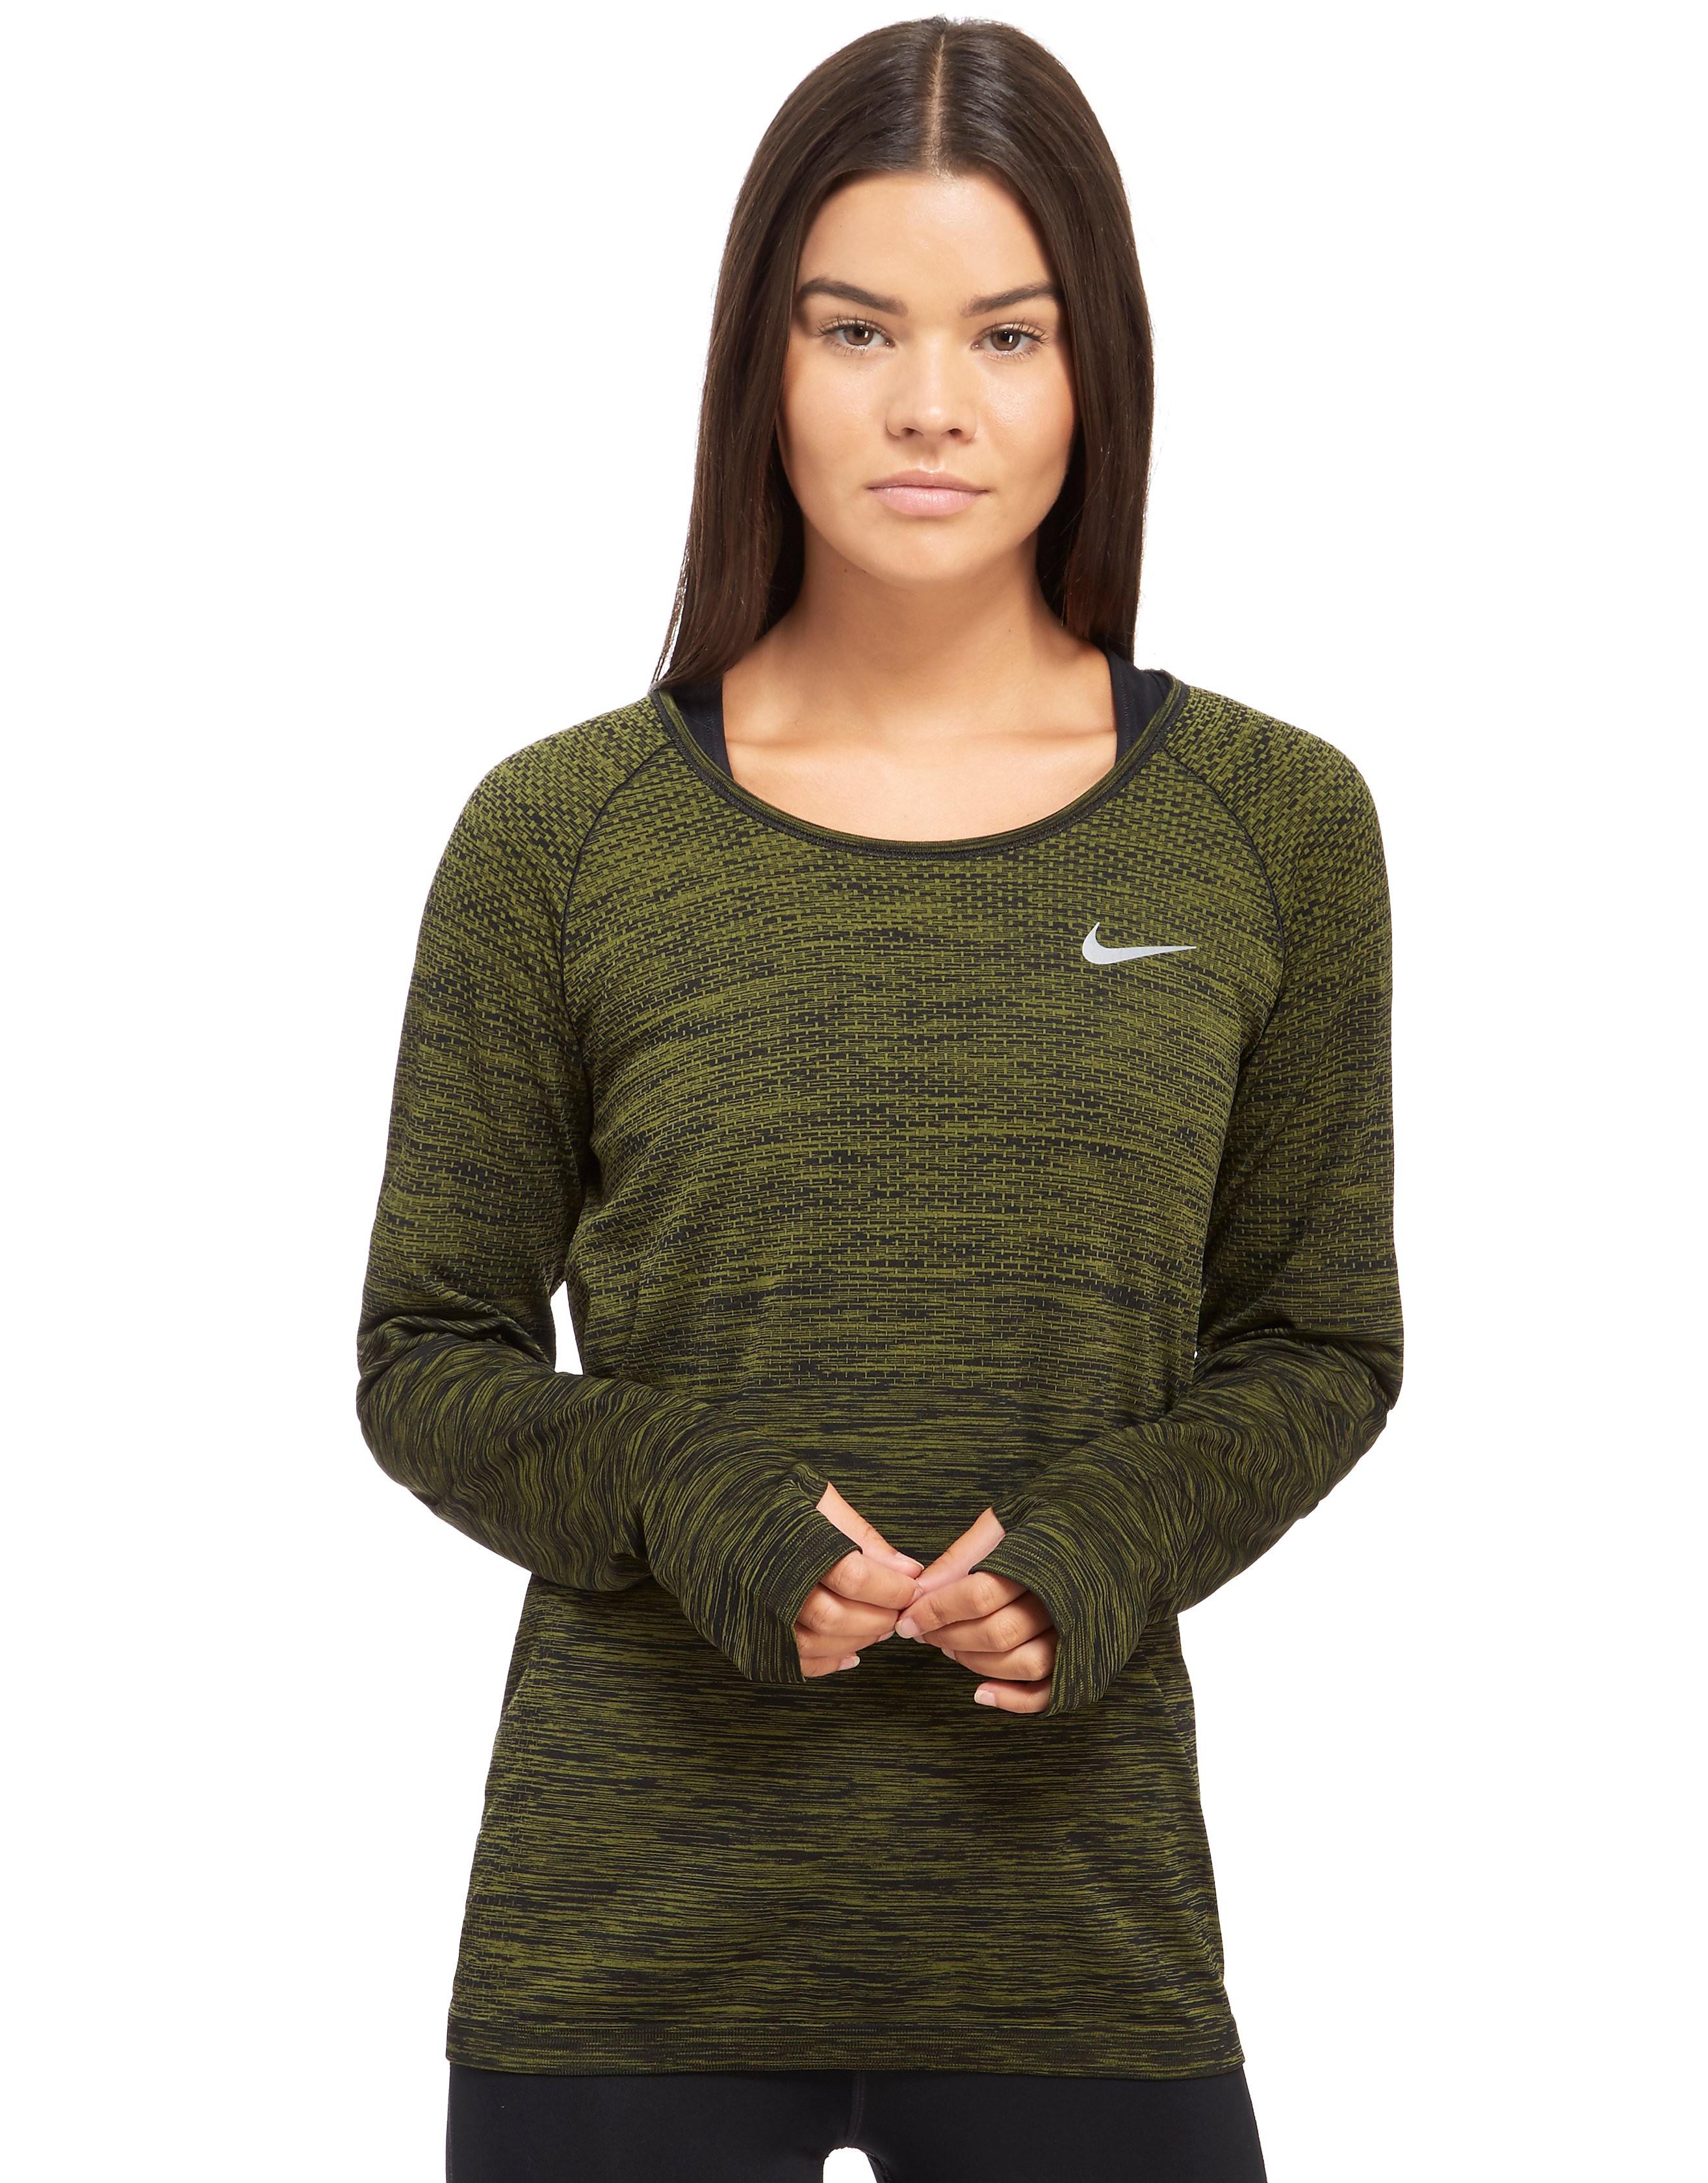 Nike Dri-FIT Knit Longsleeve Top